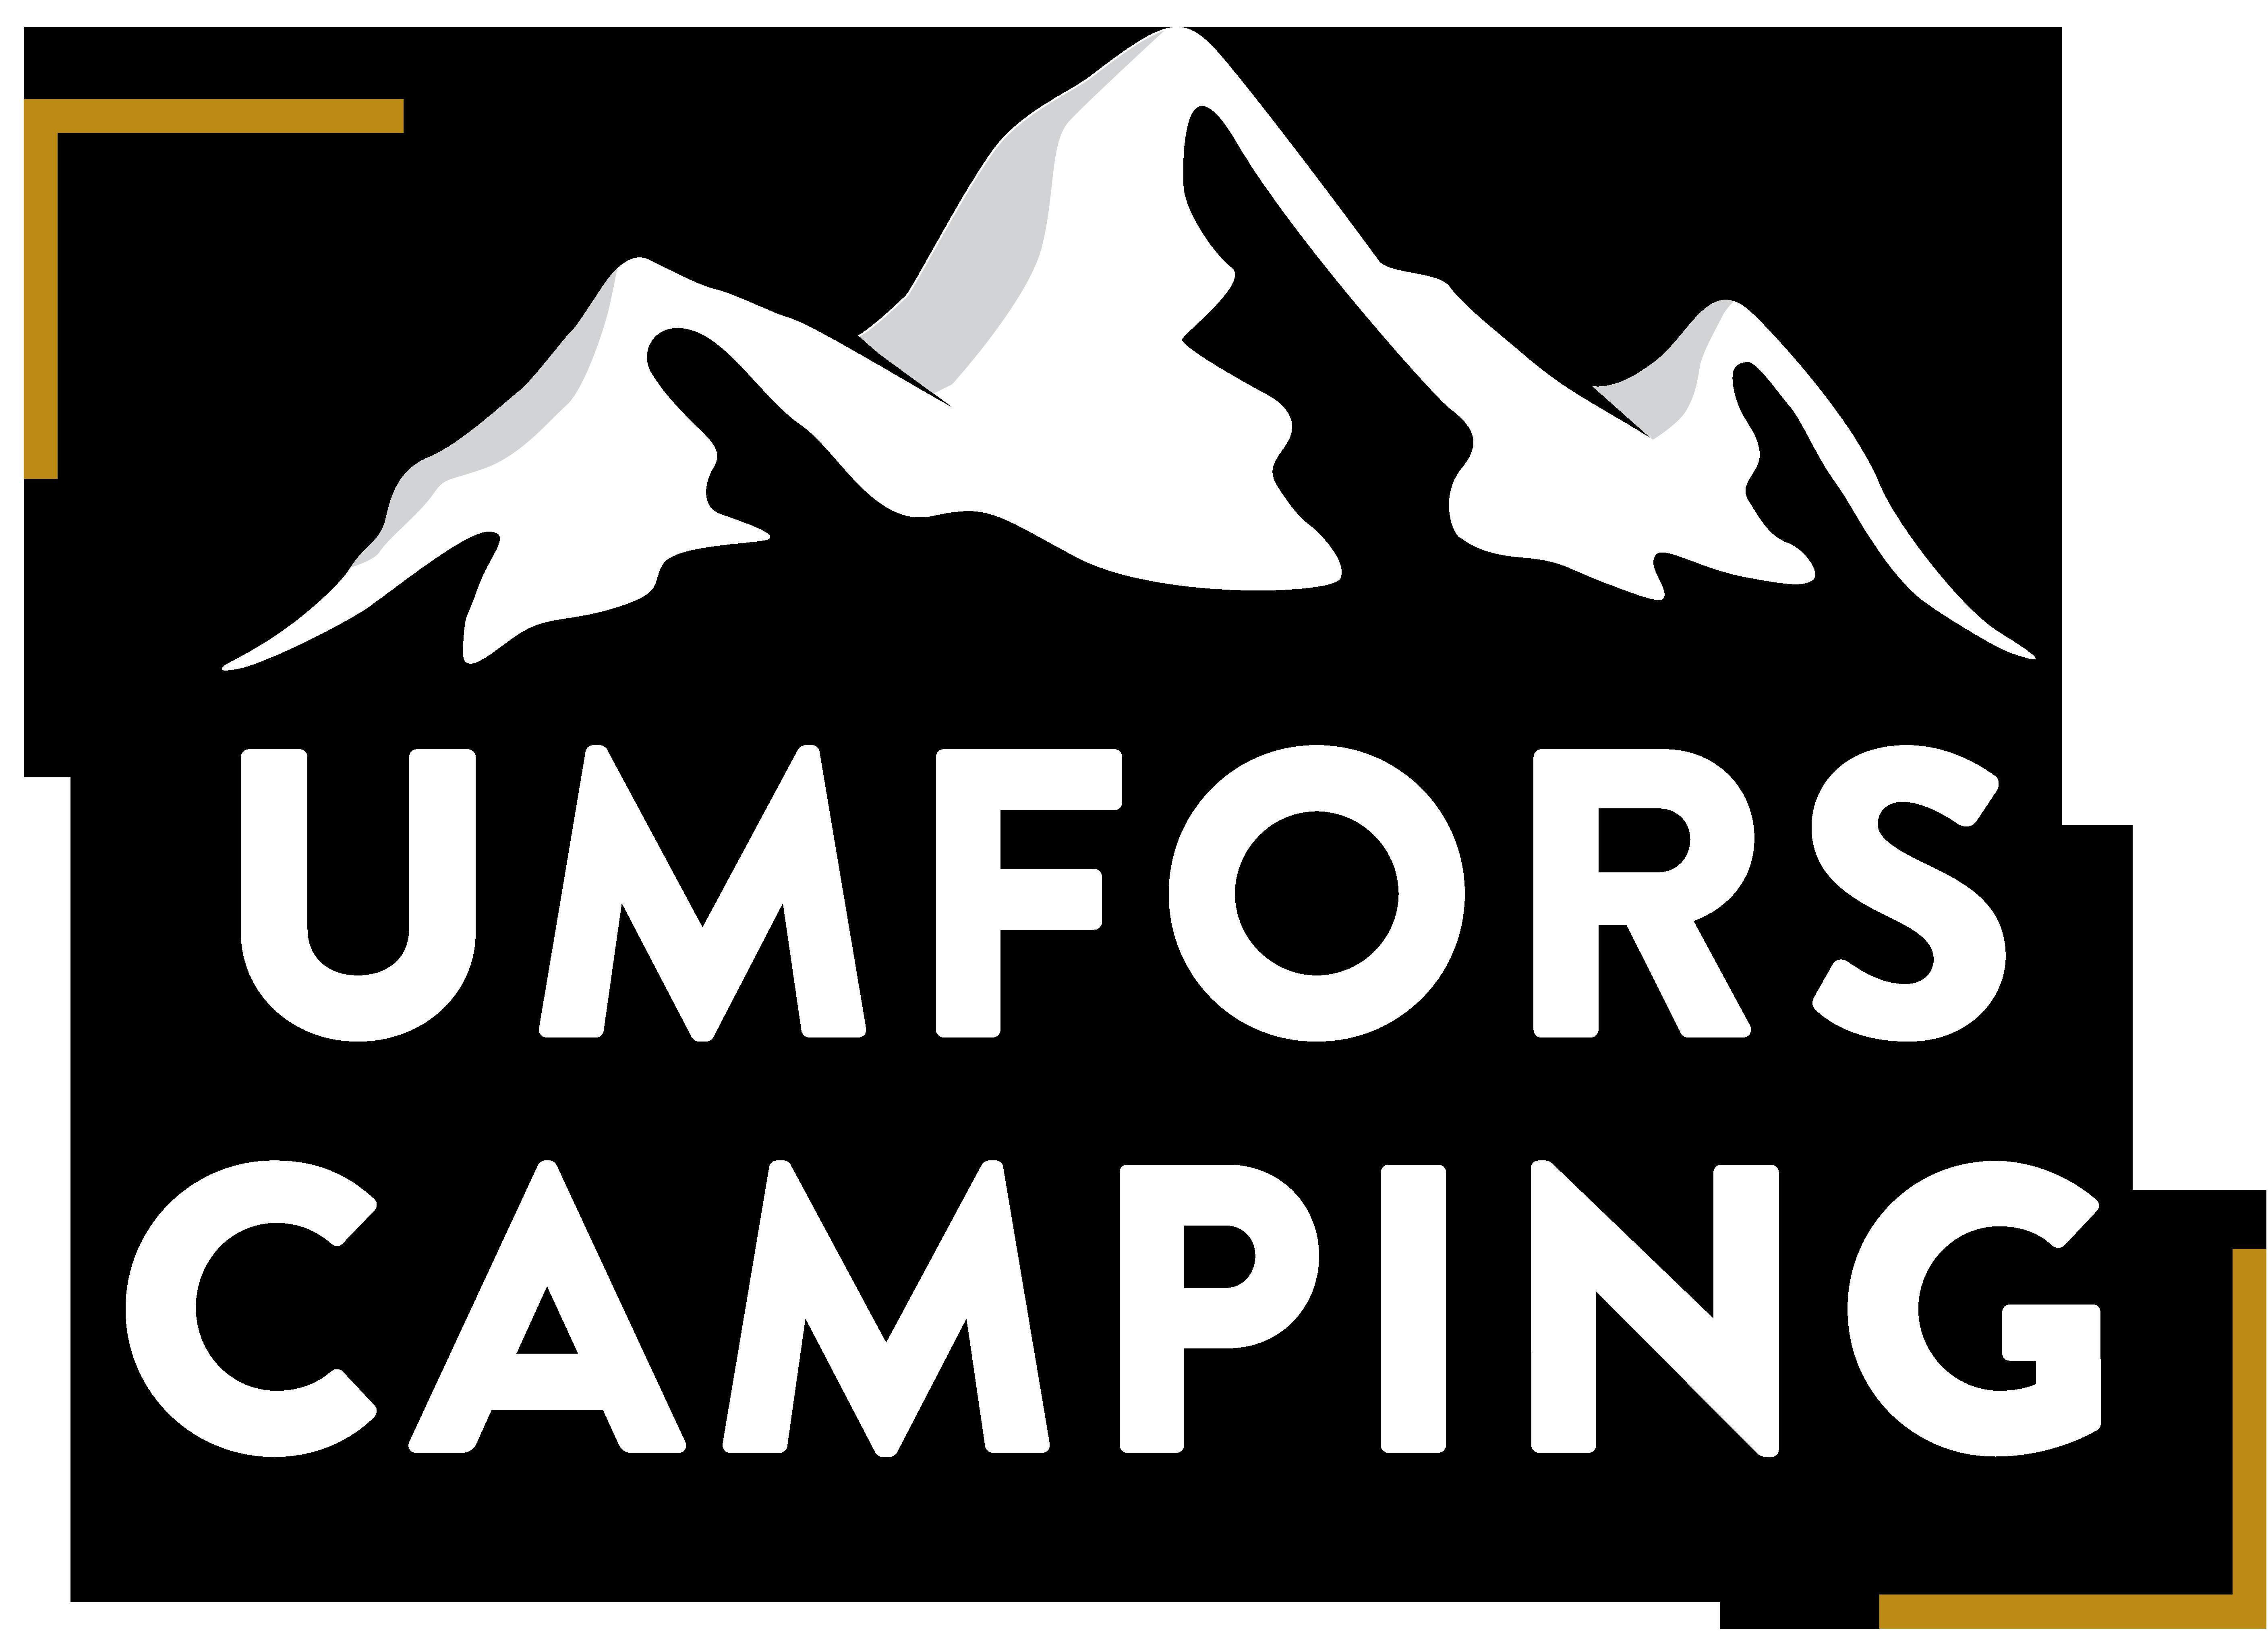 Umfors Camping